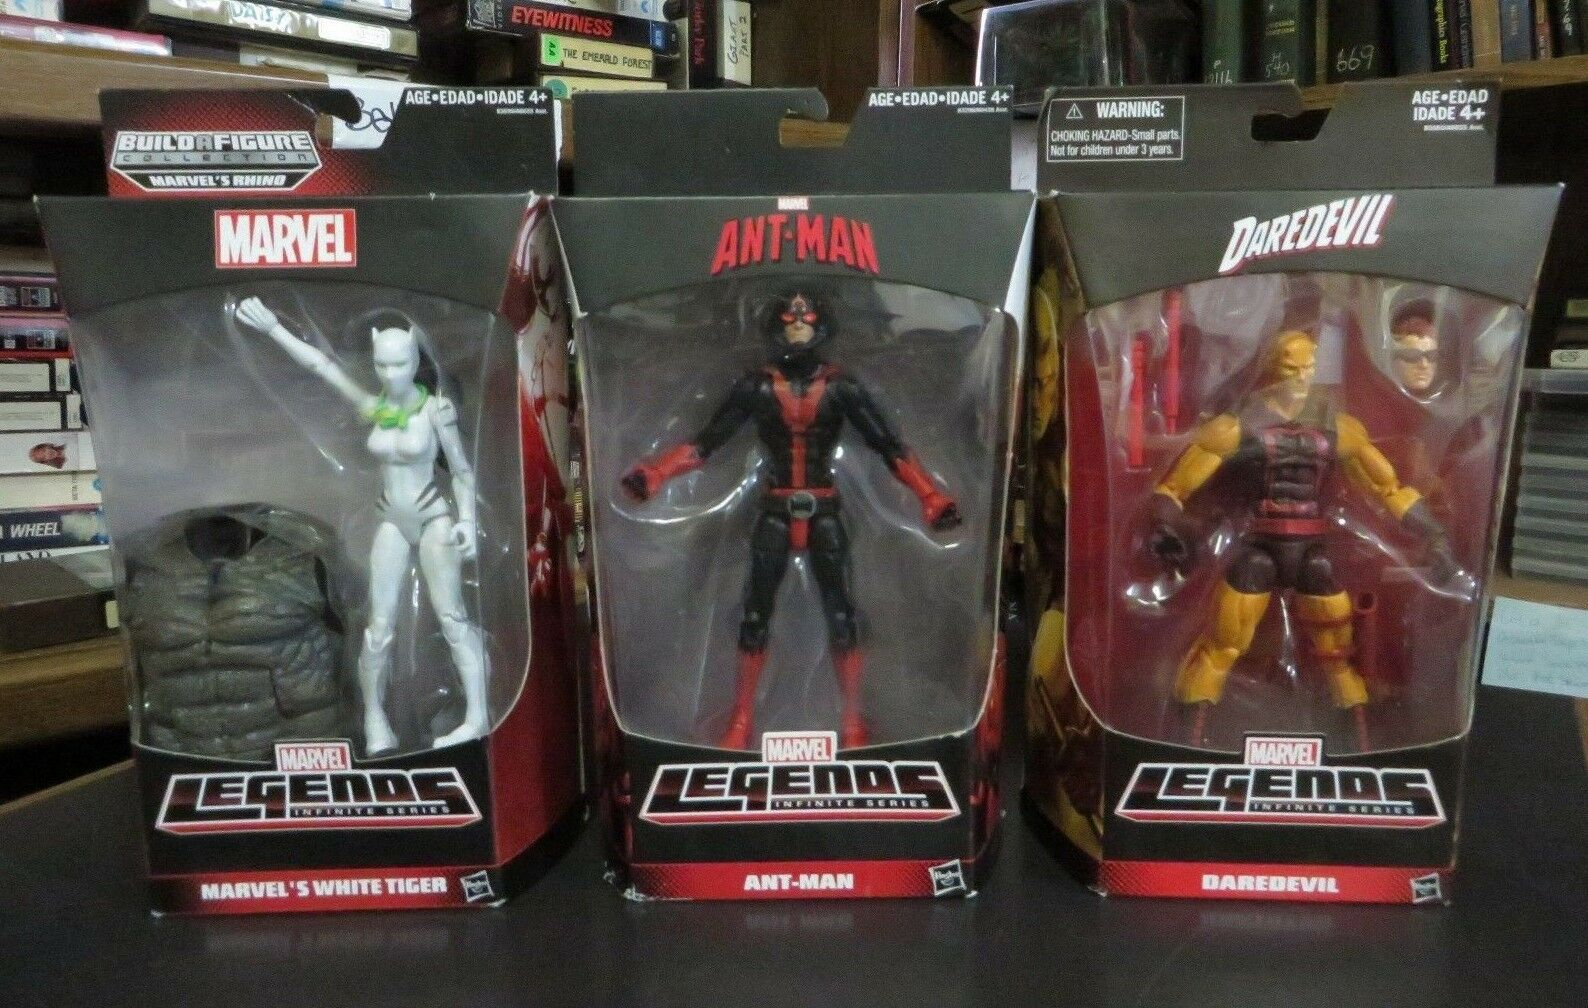 Lot of 3  Marvel  Legends Infinite Series Figures, Darougeevil Ant-Man blanc Tiger  trouvez votre favori ici